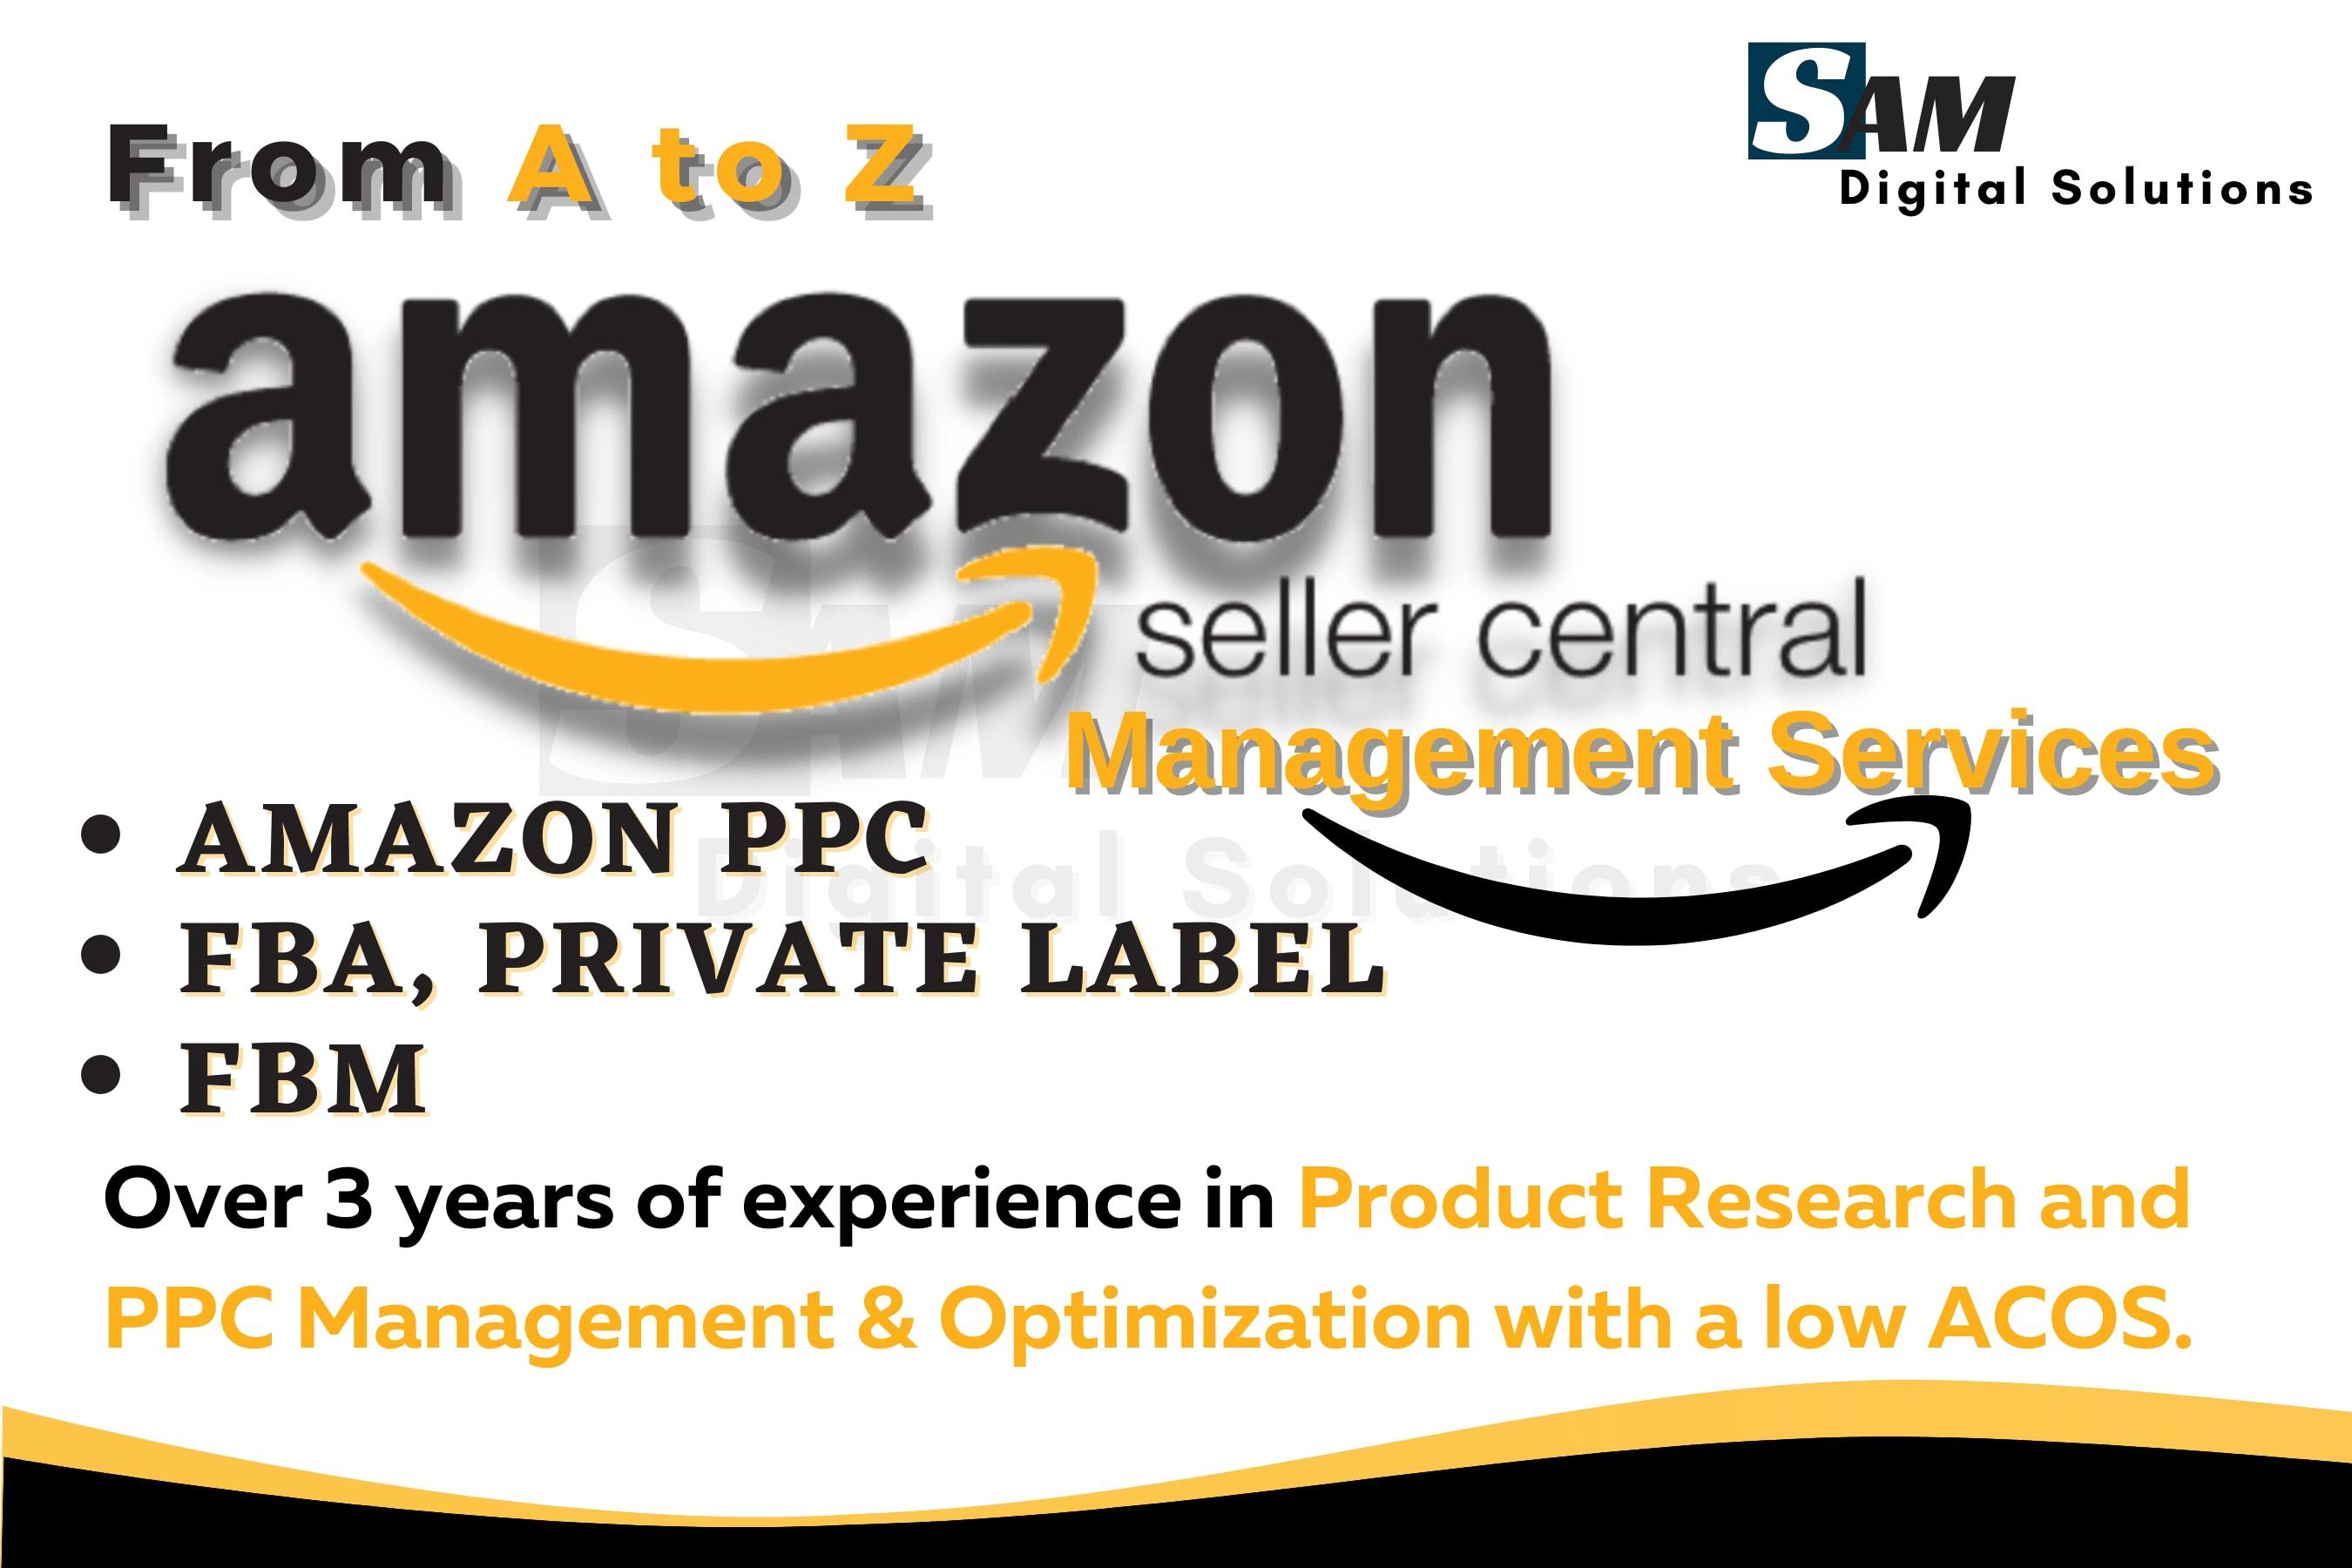 Portfolio for Amazon PPC, FBA,PL, Product Research(VA)